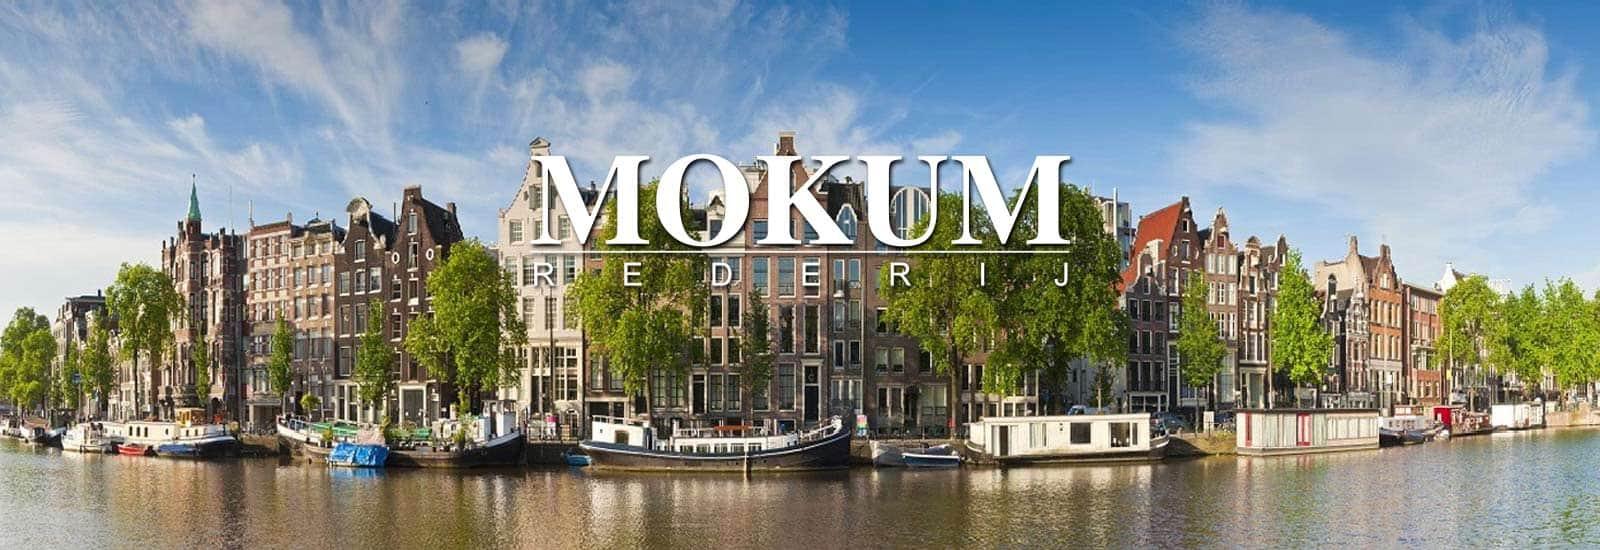 Vrij-mi-bo borrelen boot Amsterdam